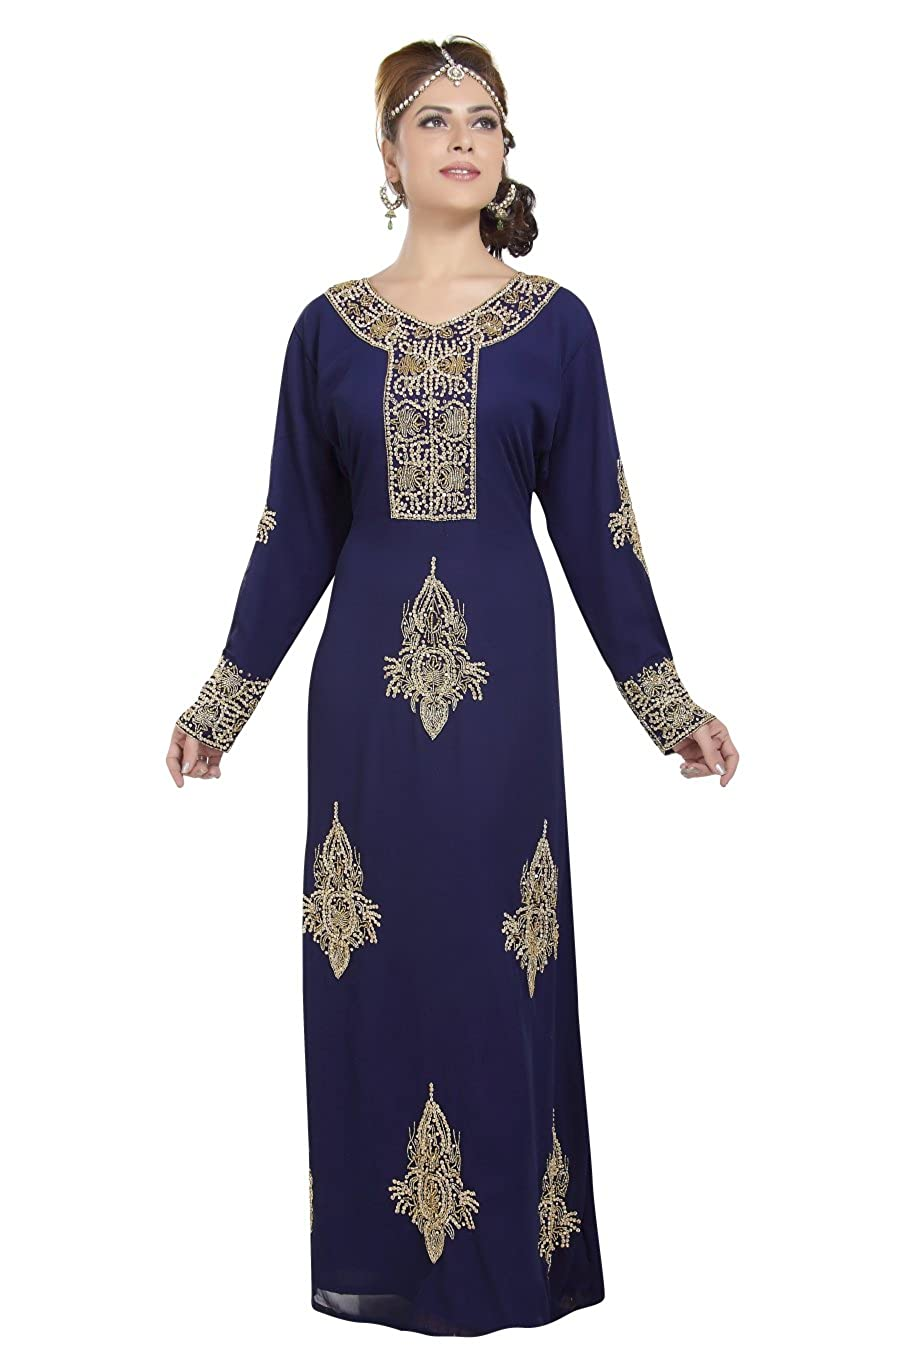 Amazon.com  Designer Wear Khaleeji Thobe for Ladies with Unique Embroidery  Design 6564  Clothing 3d410ec70